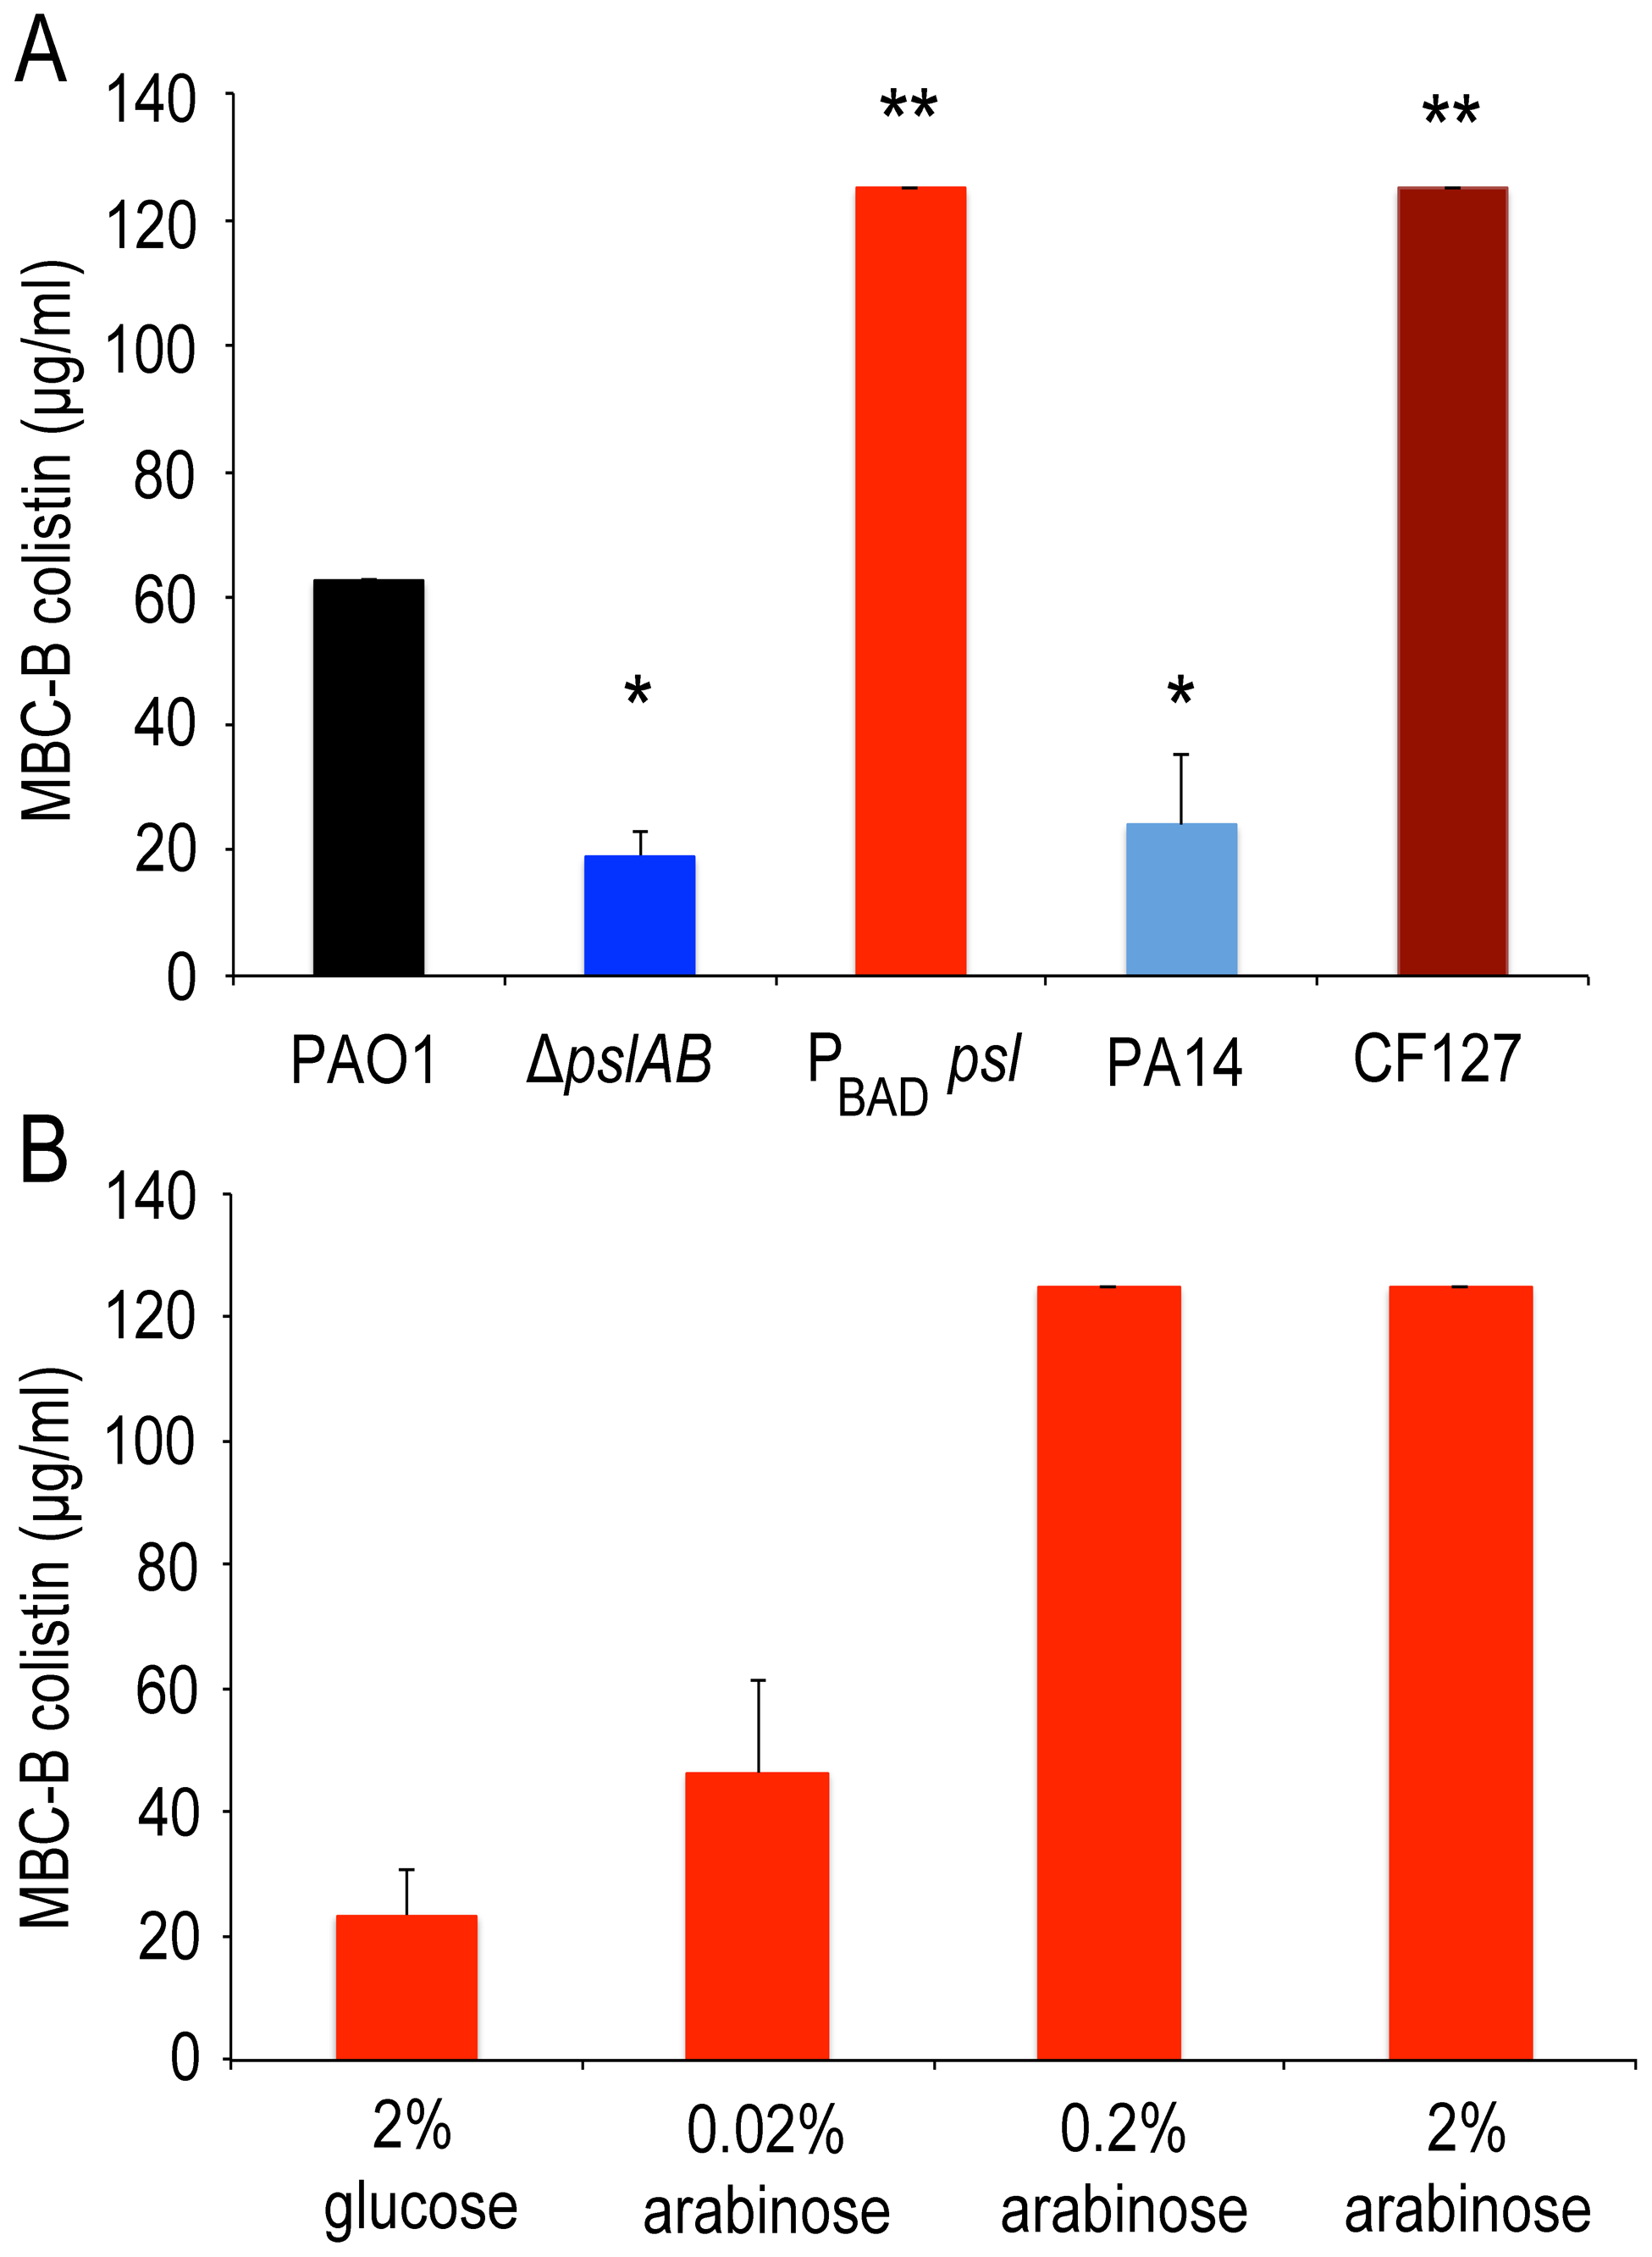 Over-expression of <i>psl</i> increases biofilm tolerance to colistin.